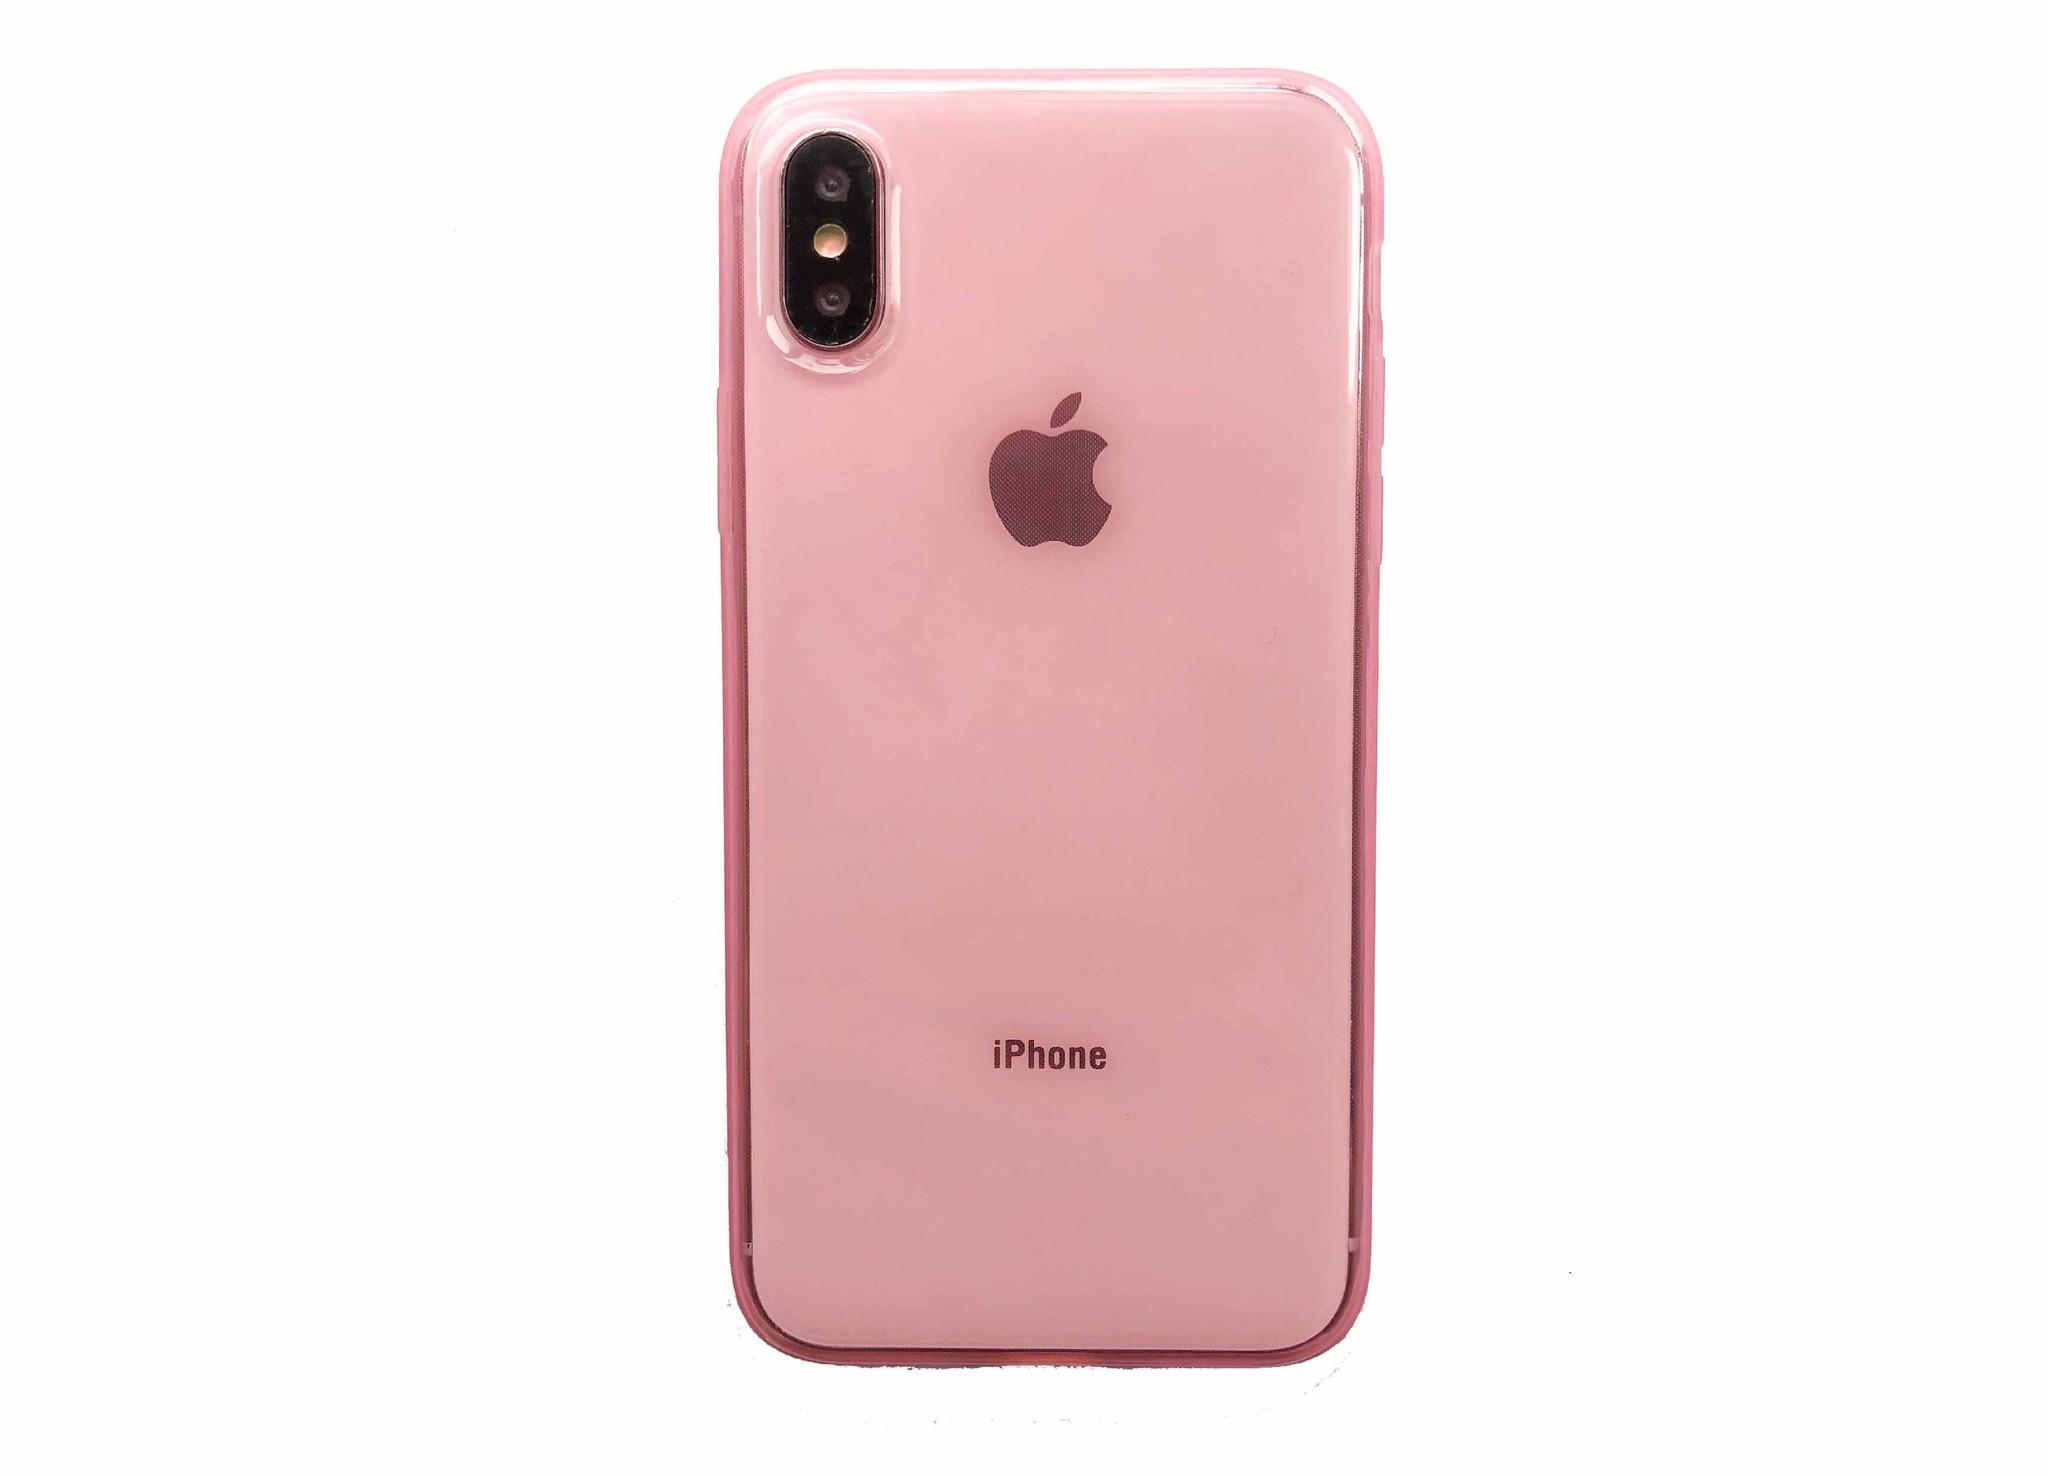 Smartphonehoesje iPhone 11 Pro | Roze / transparant